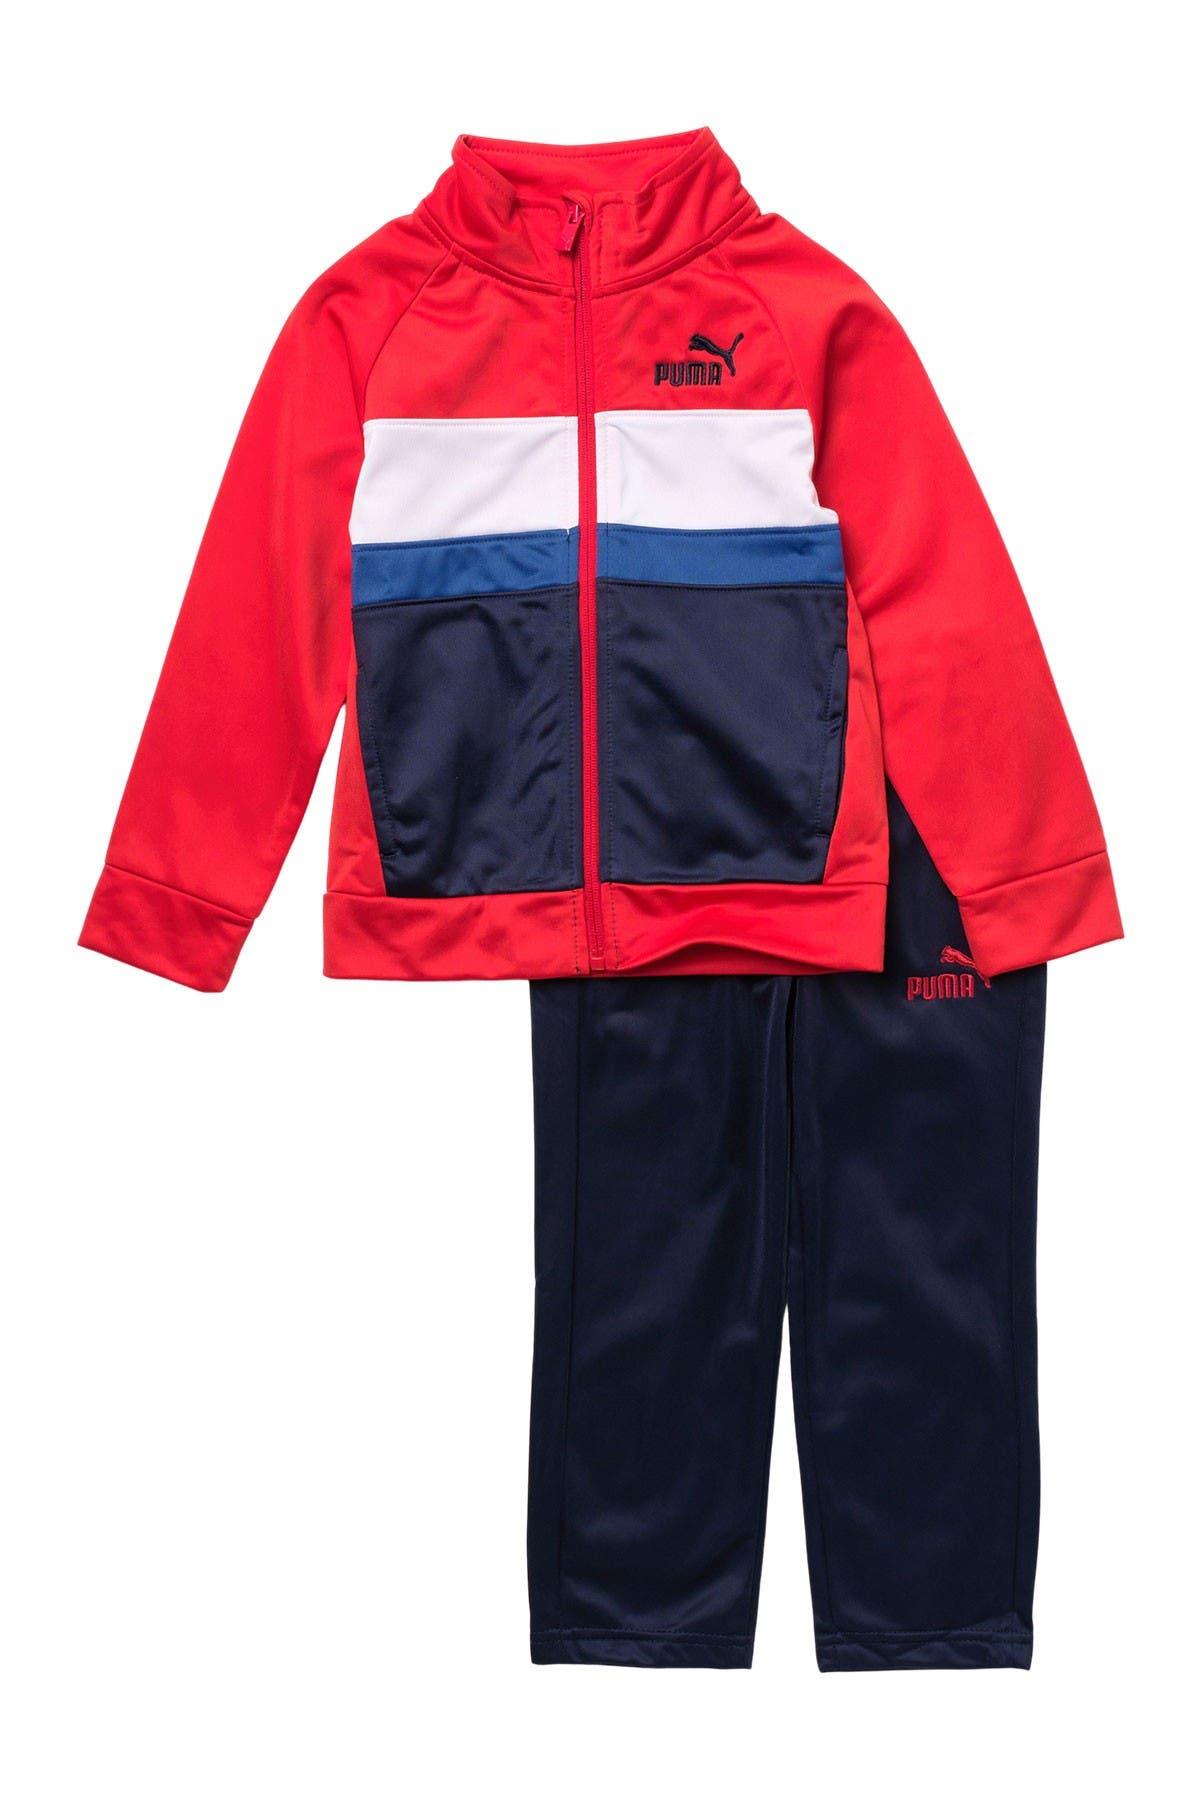 PUMA Baby Boys 2-Piece Zip up Track Jacket and Pant Set